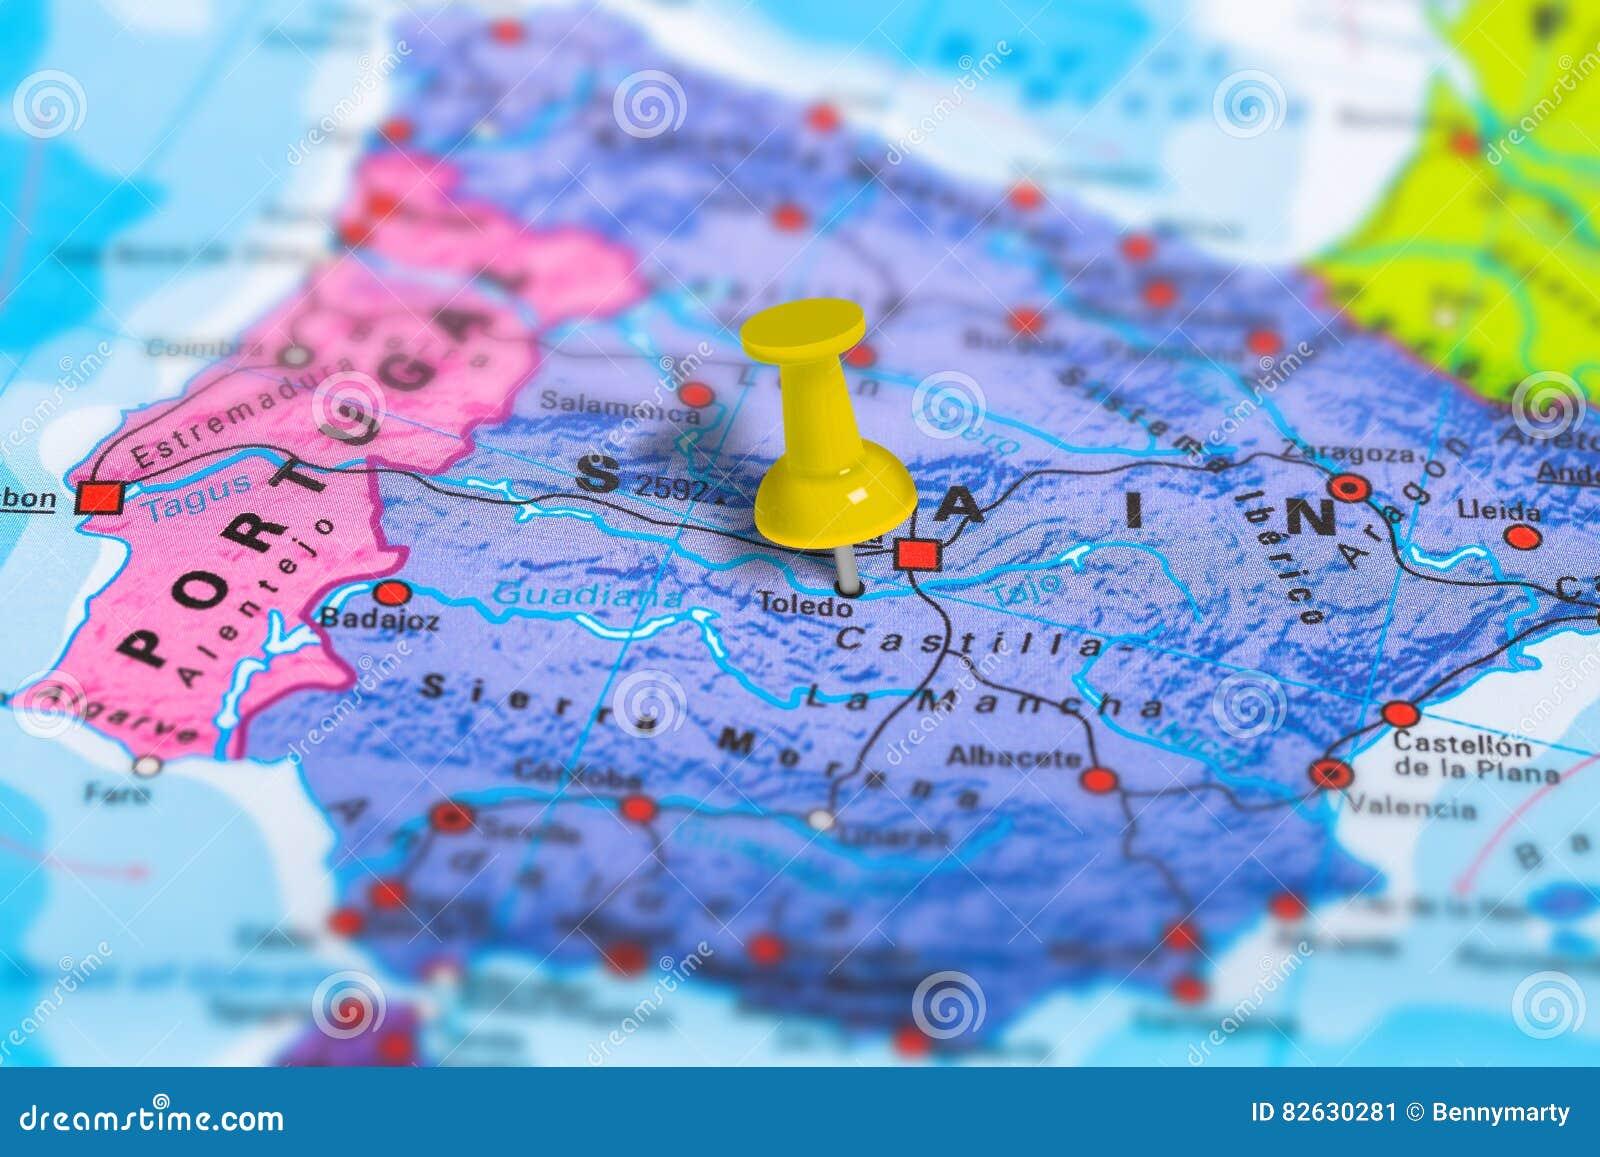 Mapa De Toledo Spain Imagem De Stock Imagem De Geopolitical